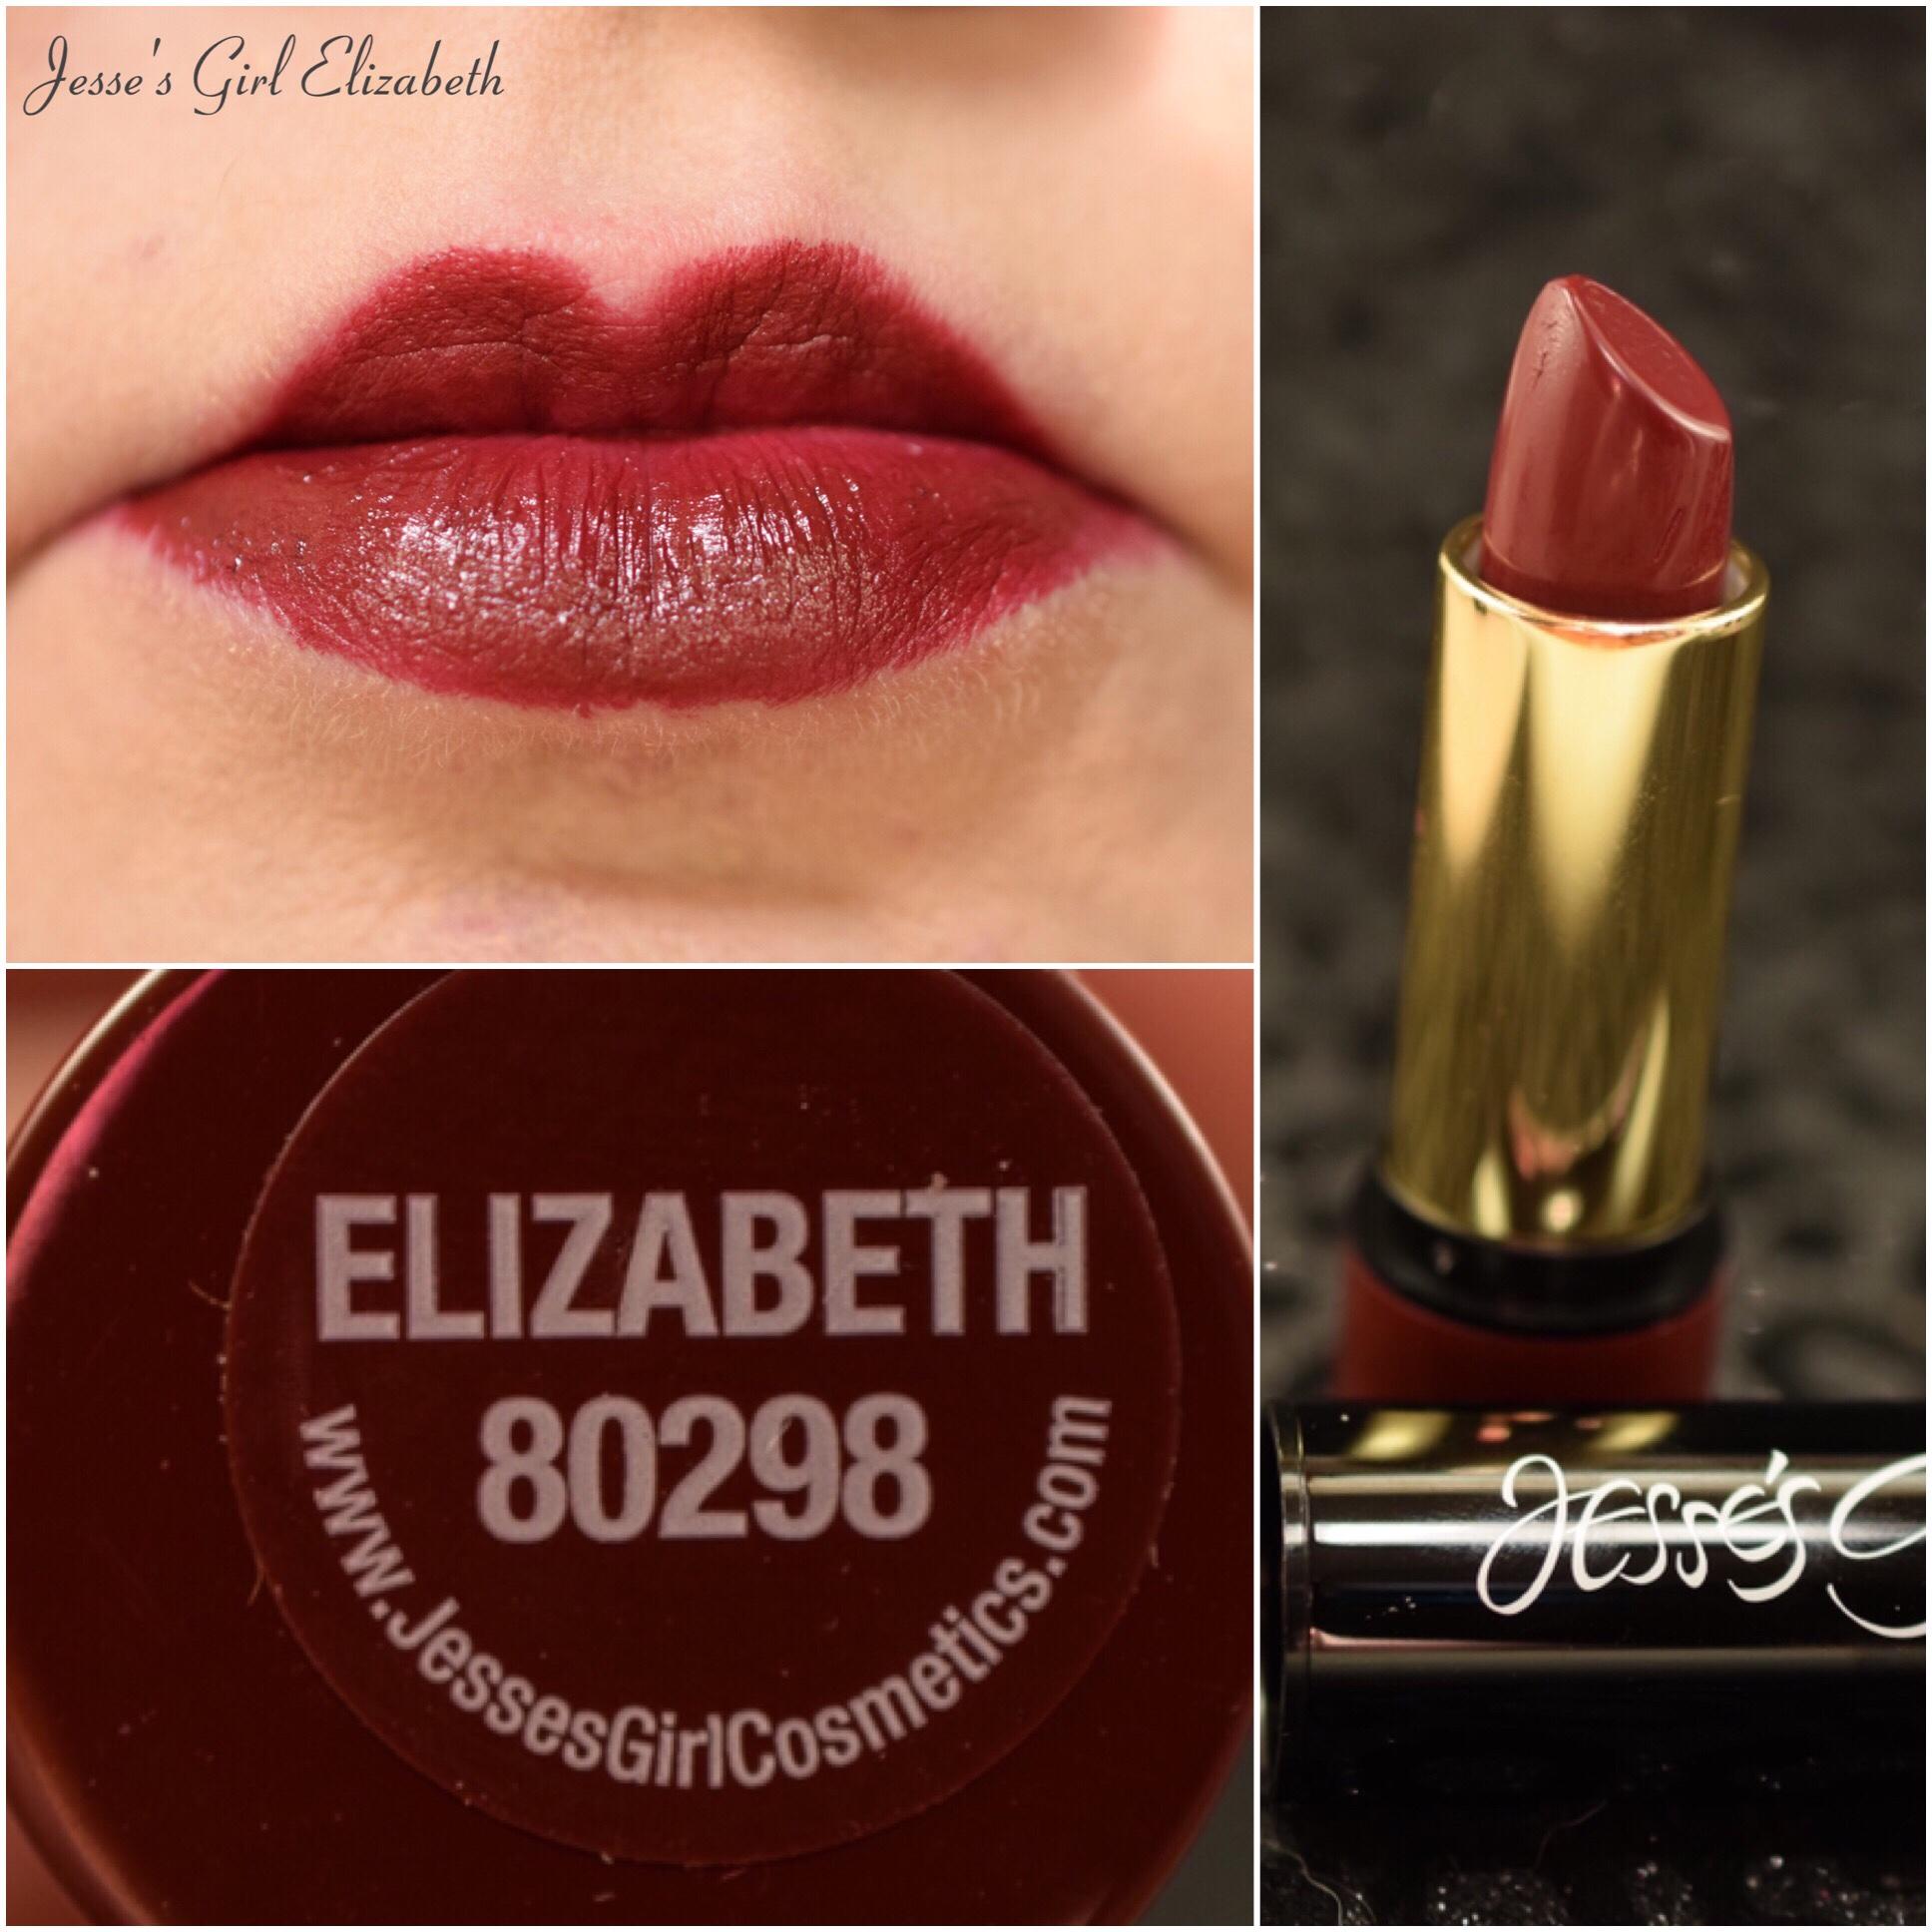 Jesse's Girl Elizabeth